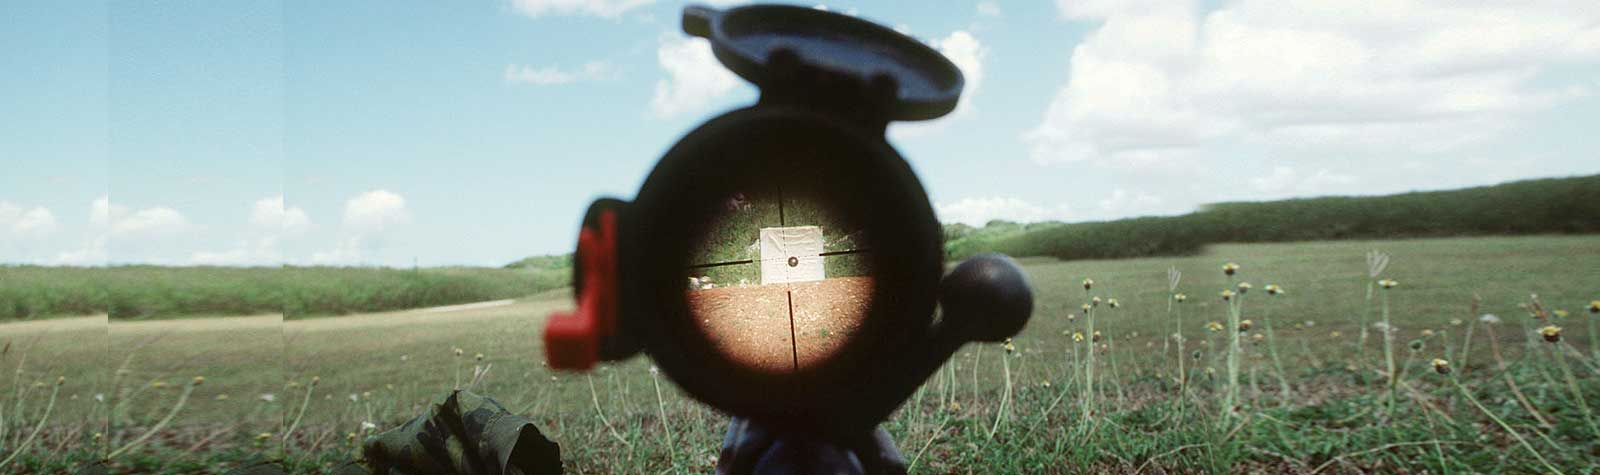 Long Range Spotting Scopes: The Definitive Guide